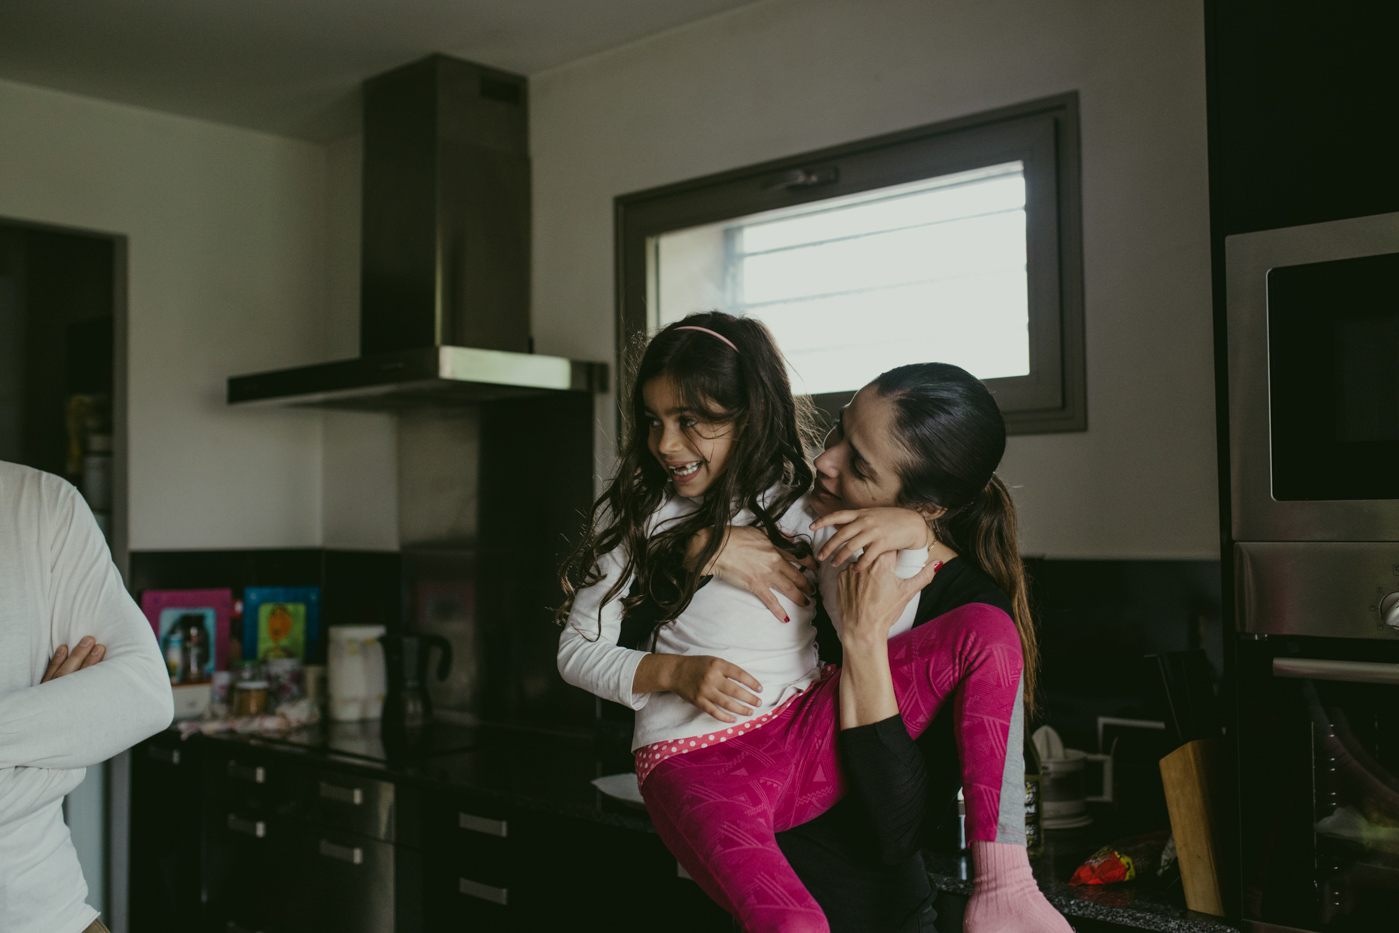 Velvet-Hush-fotografos-sesion-familia-005